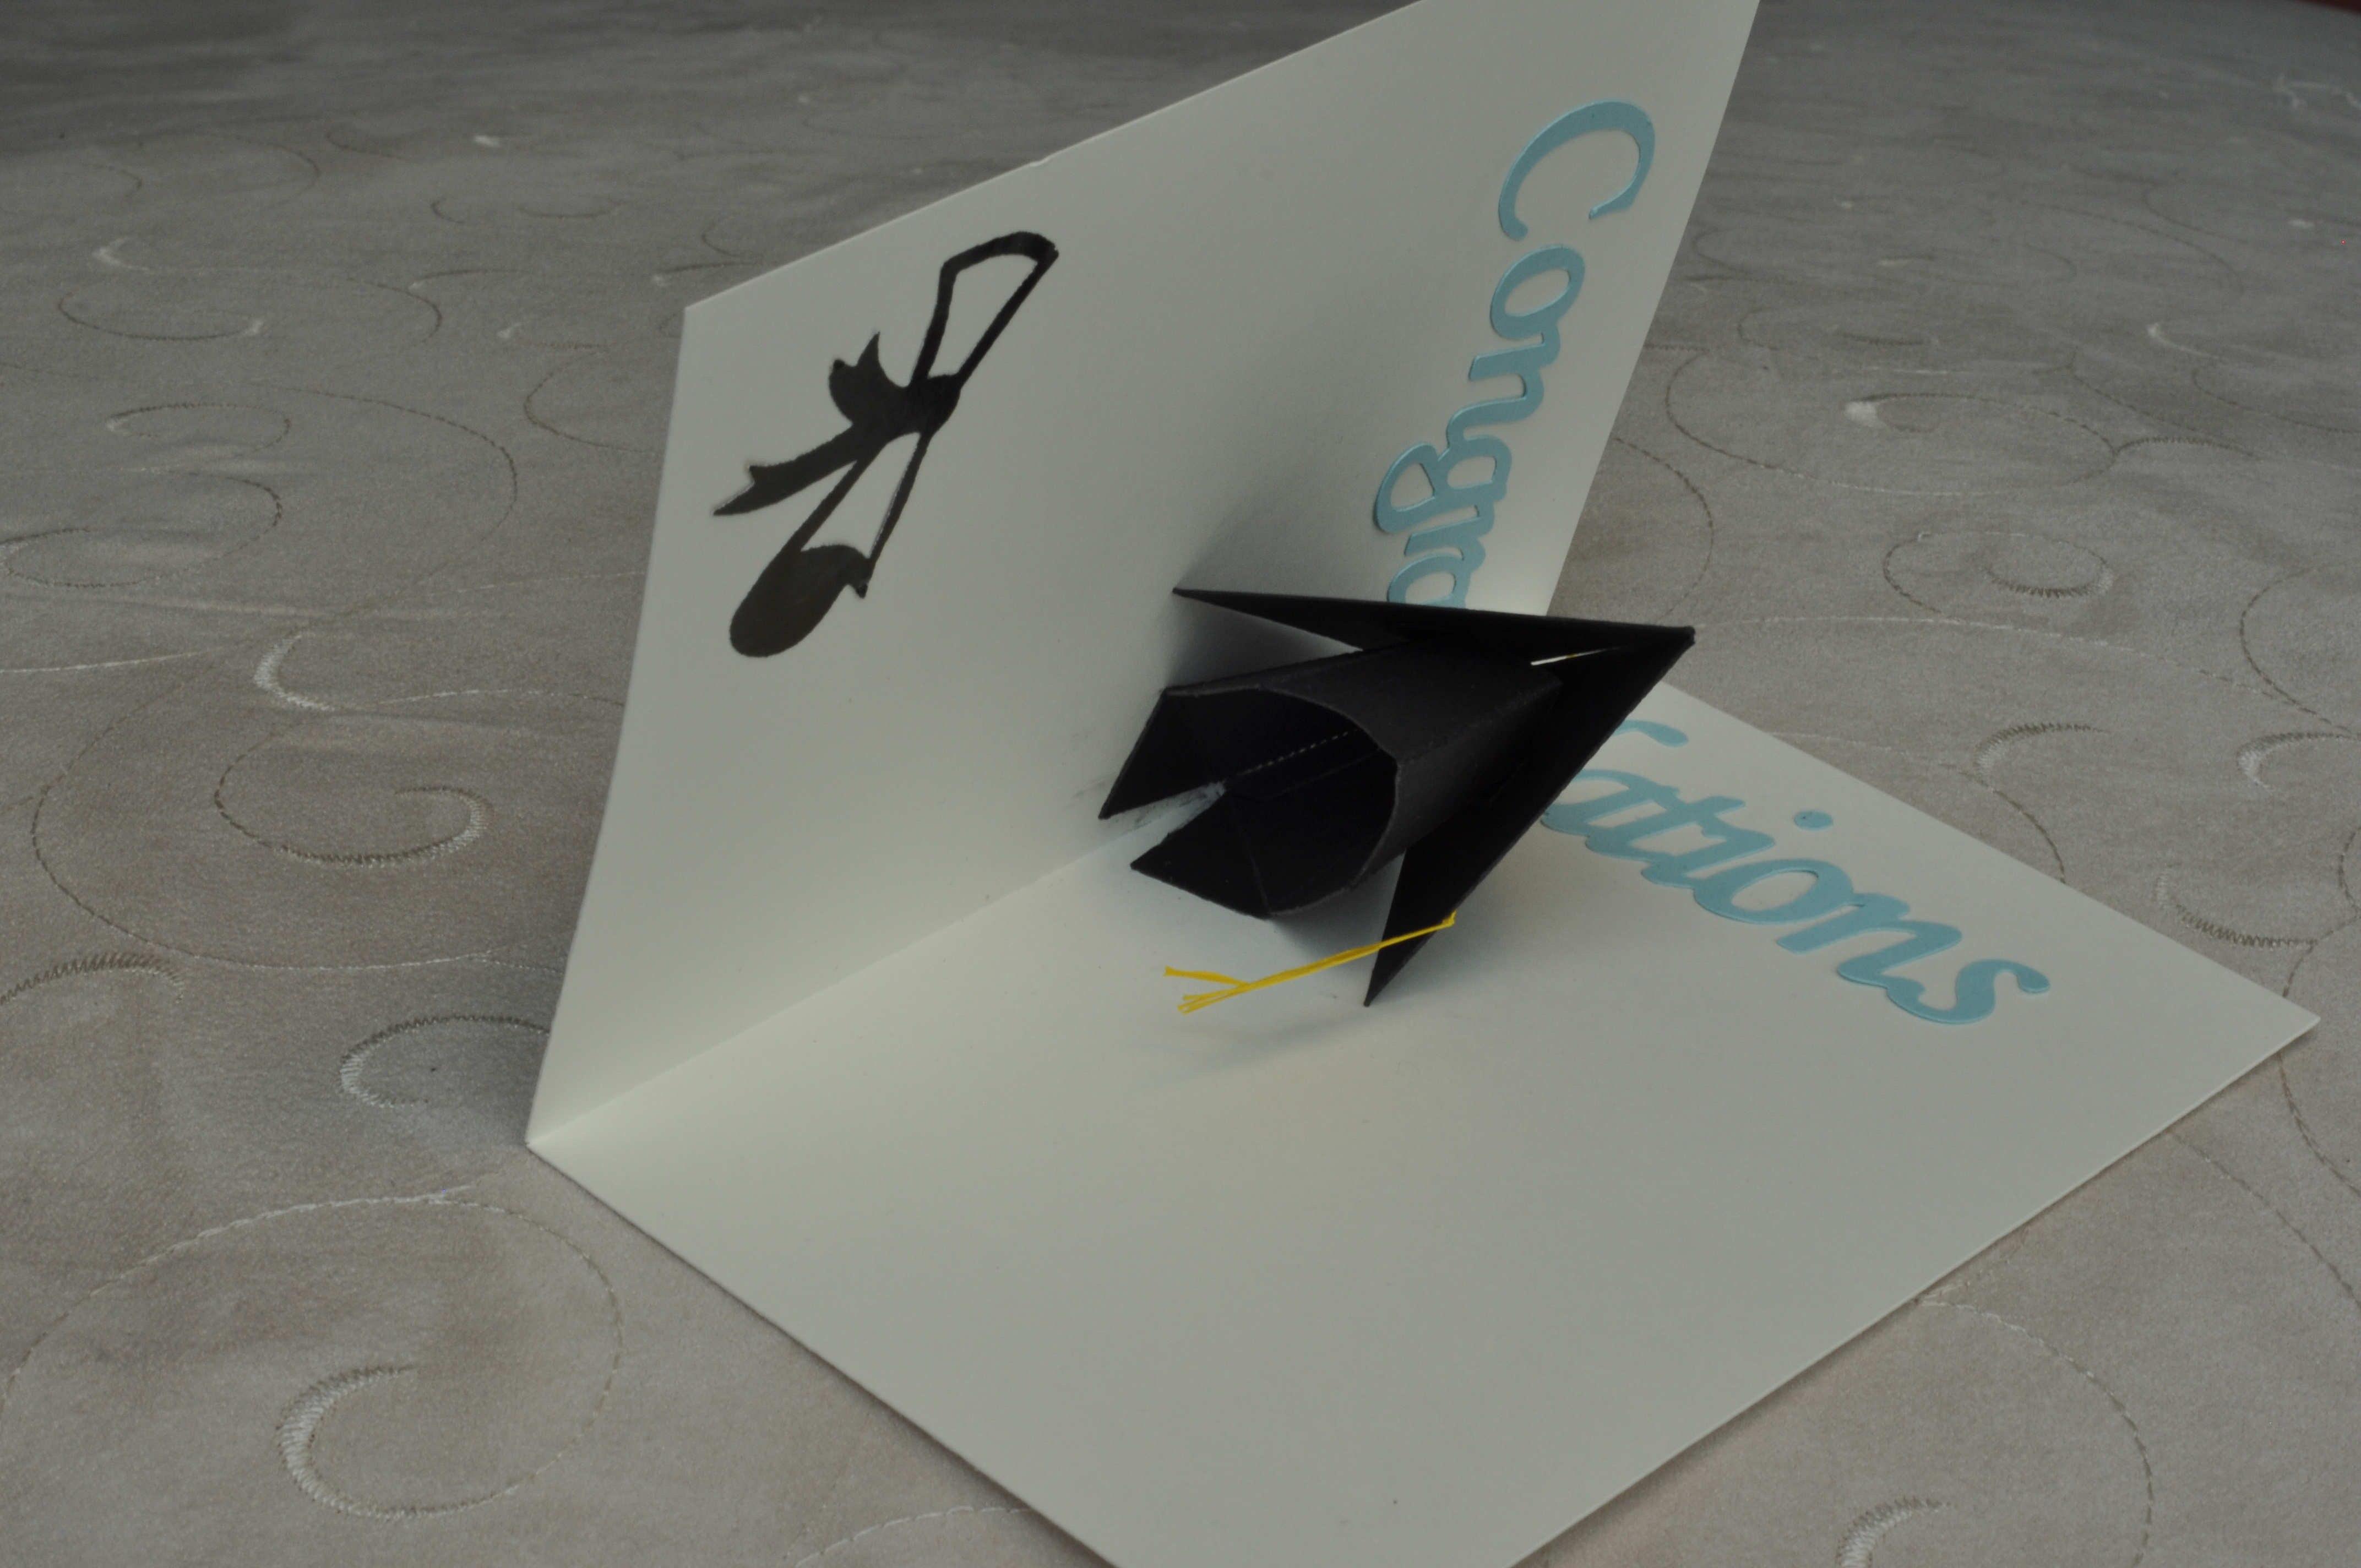 D Graduation Cap Pop Up Card Template  Creative Pop Up Cards In Graduation Pop Up Card Template